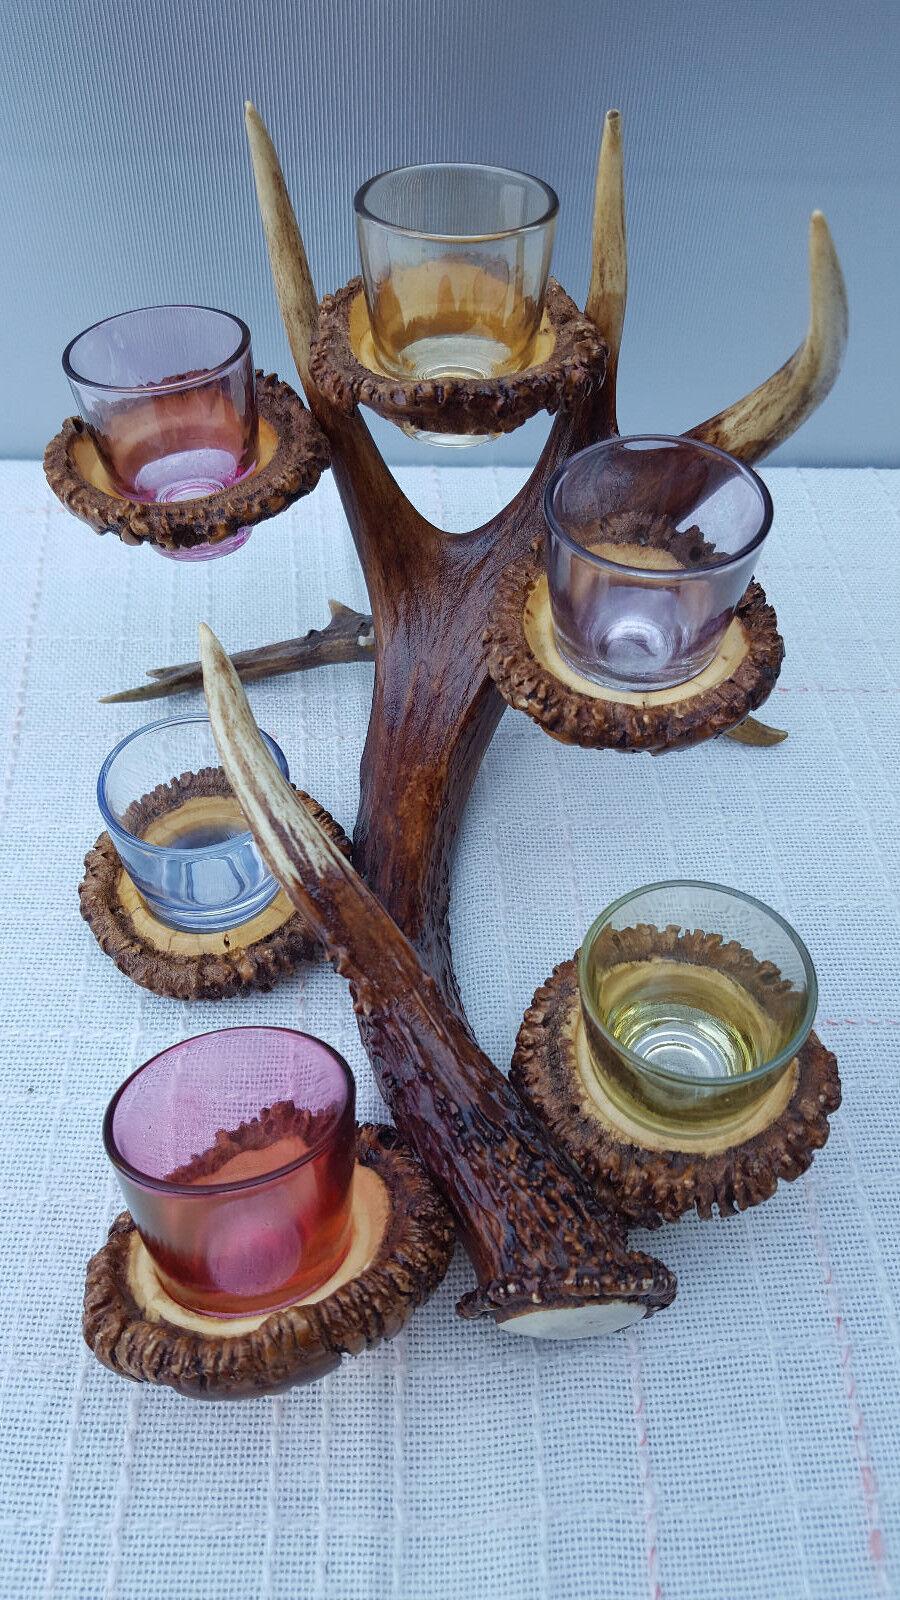 6 Alcool Verres MultiCouleures cerf bois Alcool Verres Monture véritable Hirschhorn